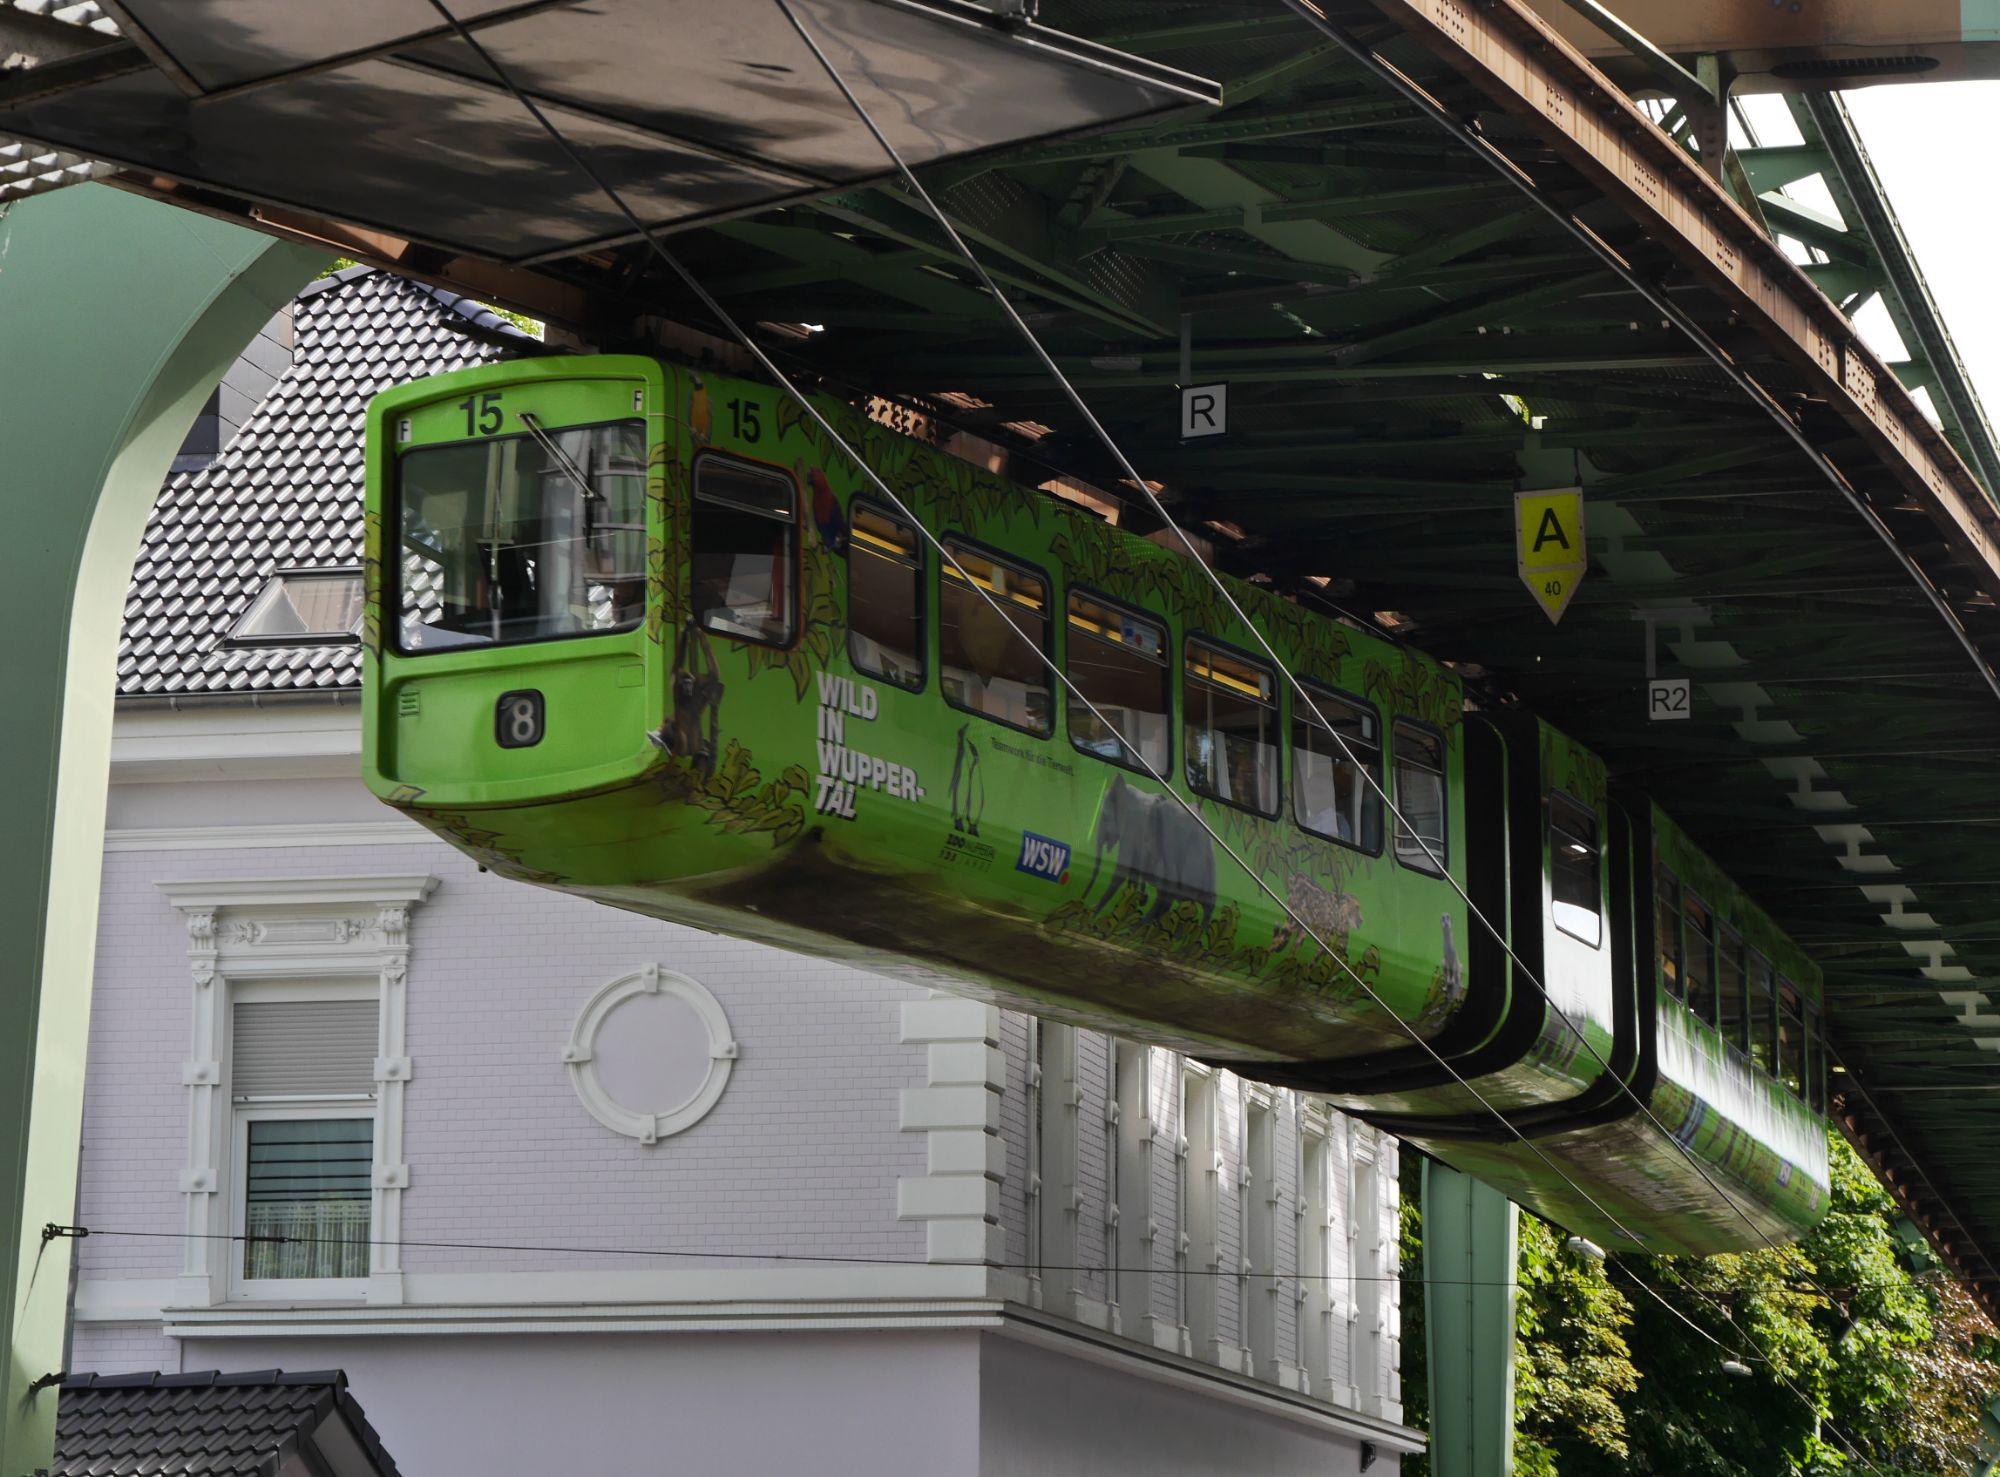 170608 Wuppertal (6)